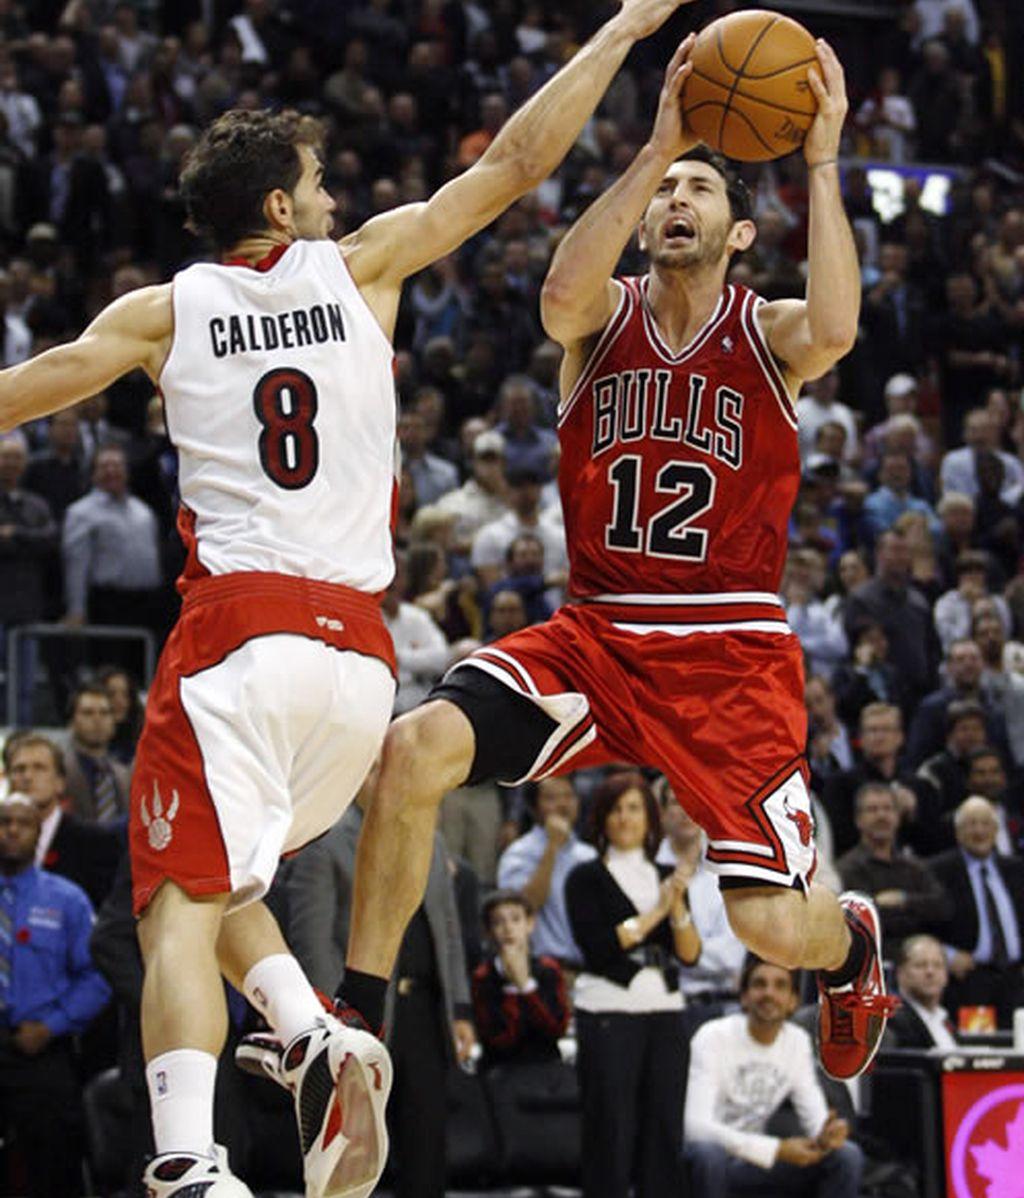 Raptors Vs. Bulls